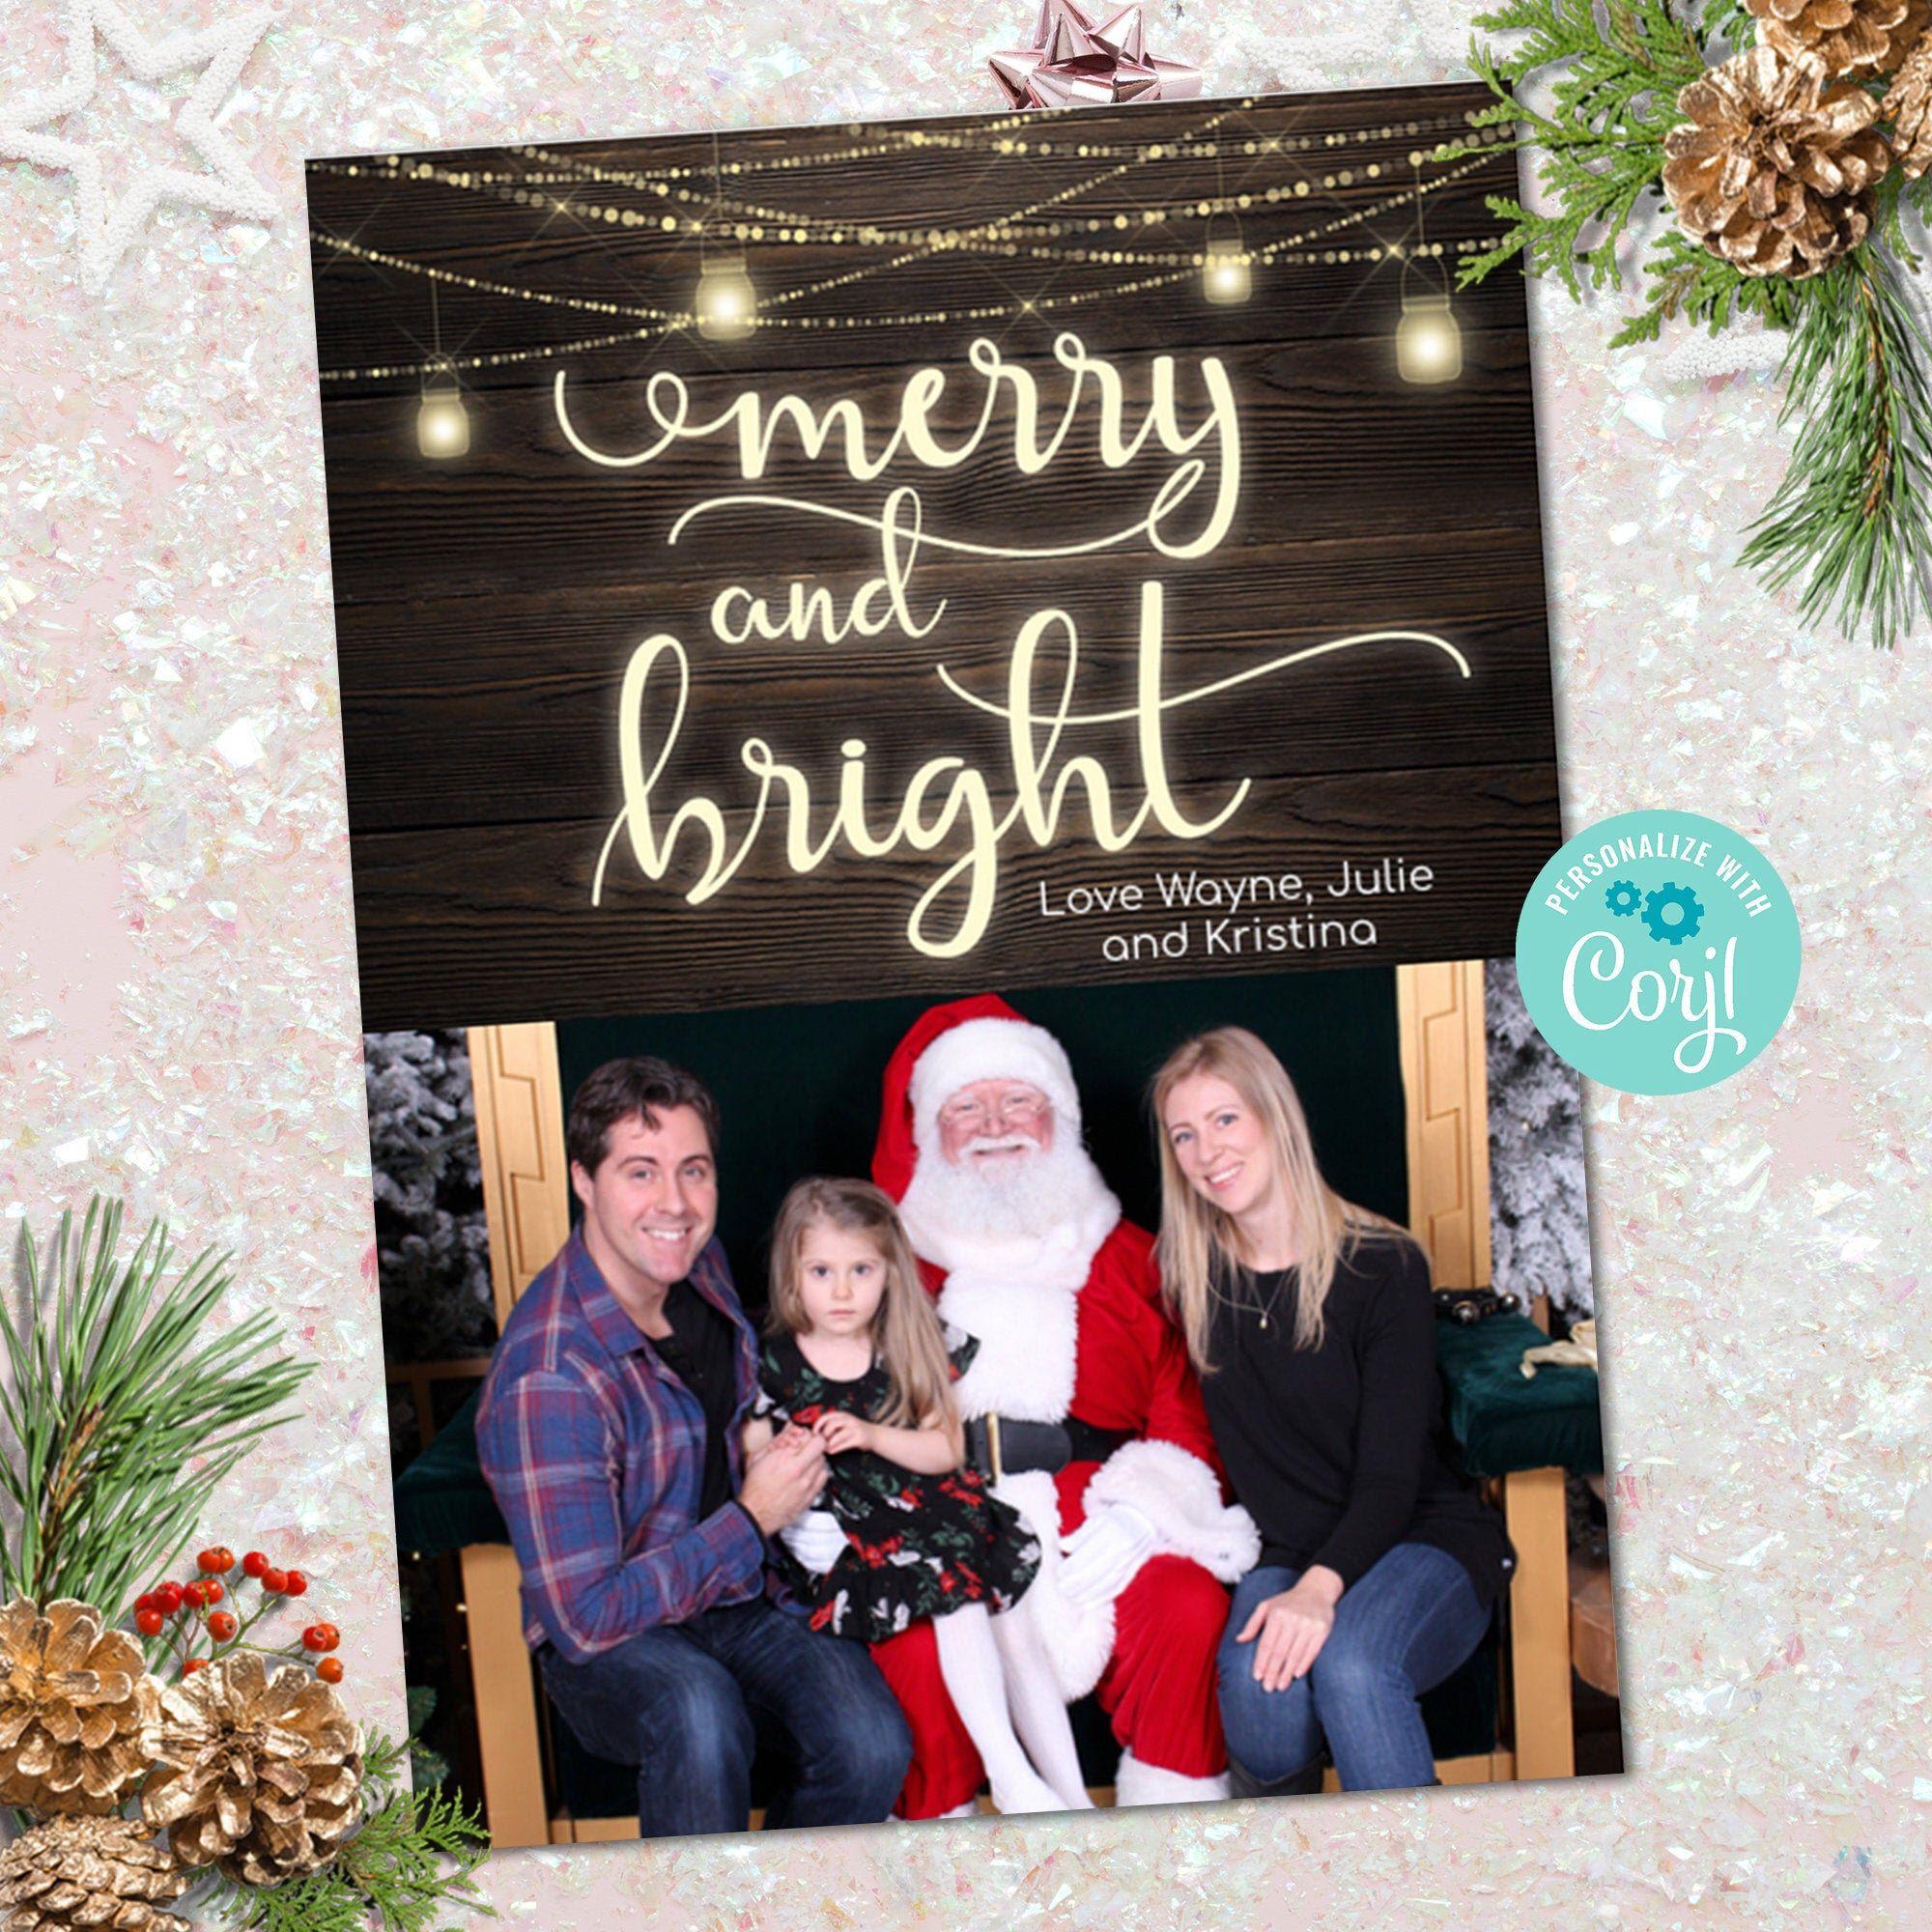 Family Photo Christmas Card Christmas Card Template Holiday Etsy Family Christmas Card Photos Christmas Card Template Family Holiday Photo Cards